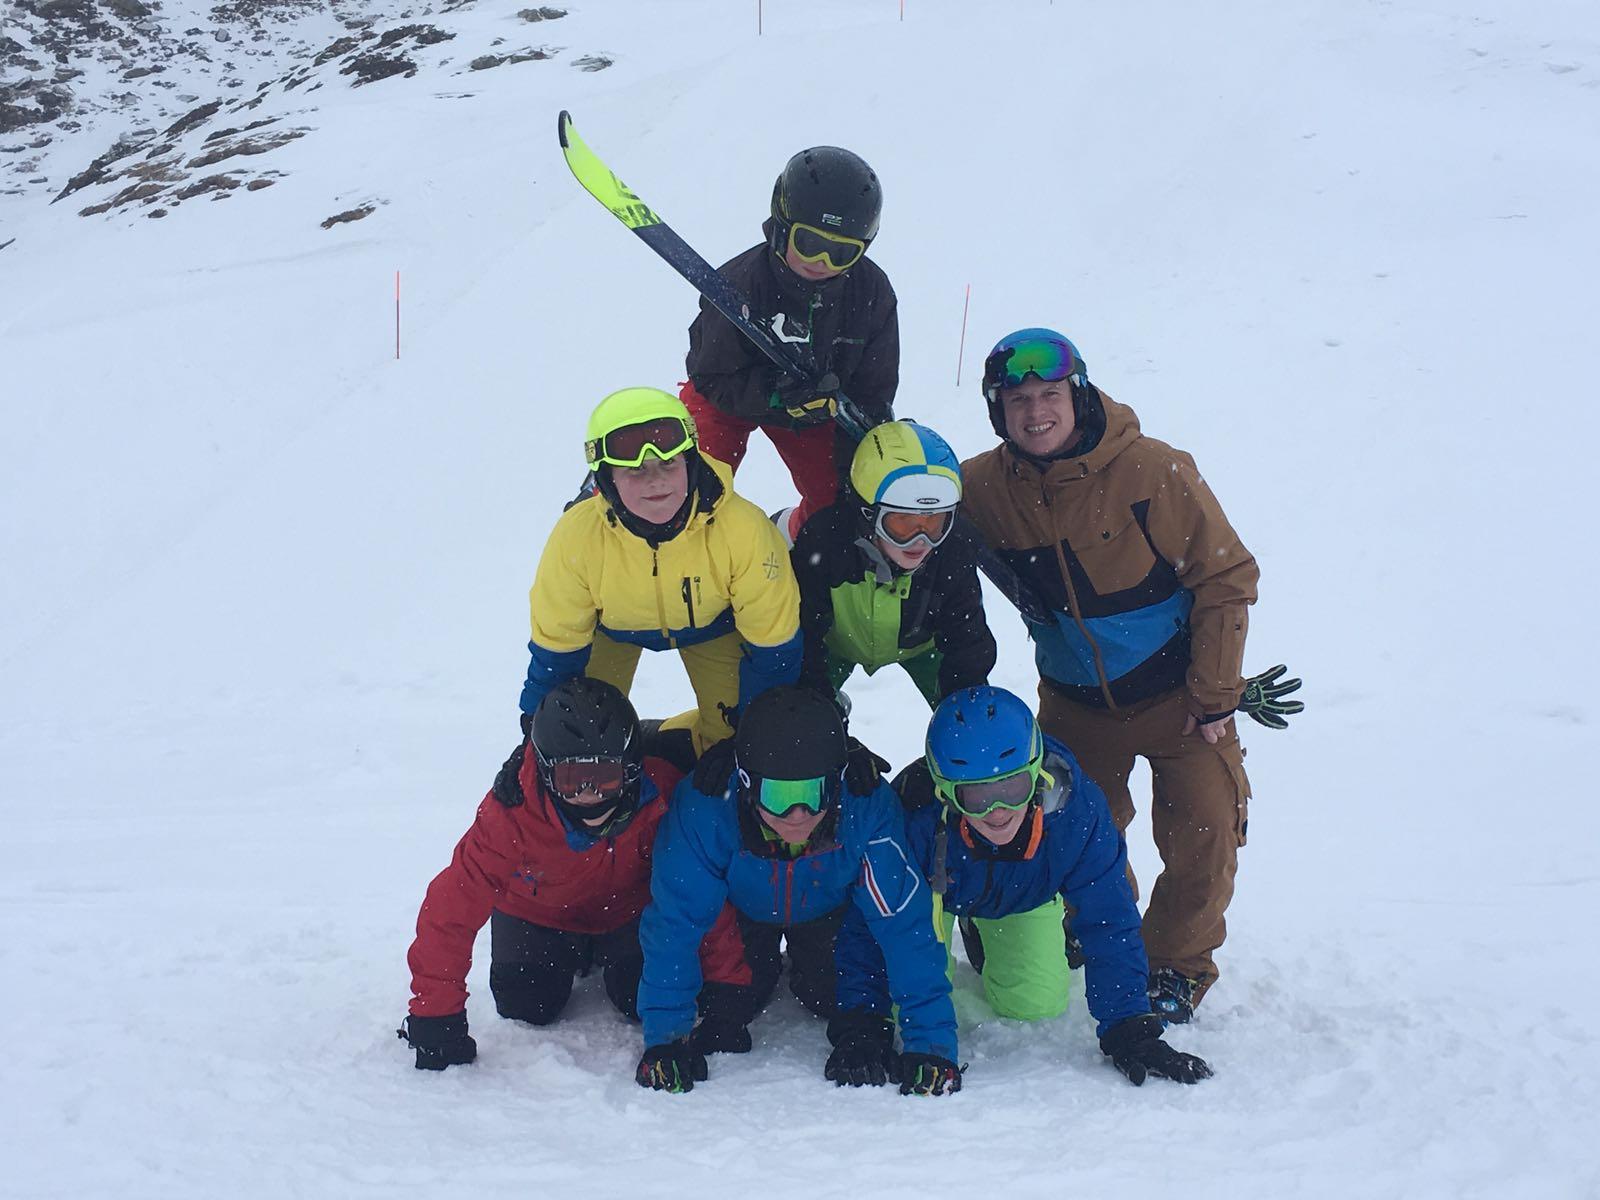 Kletterausrüstung Chur : Skilager tag 2 schule walterswil